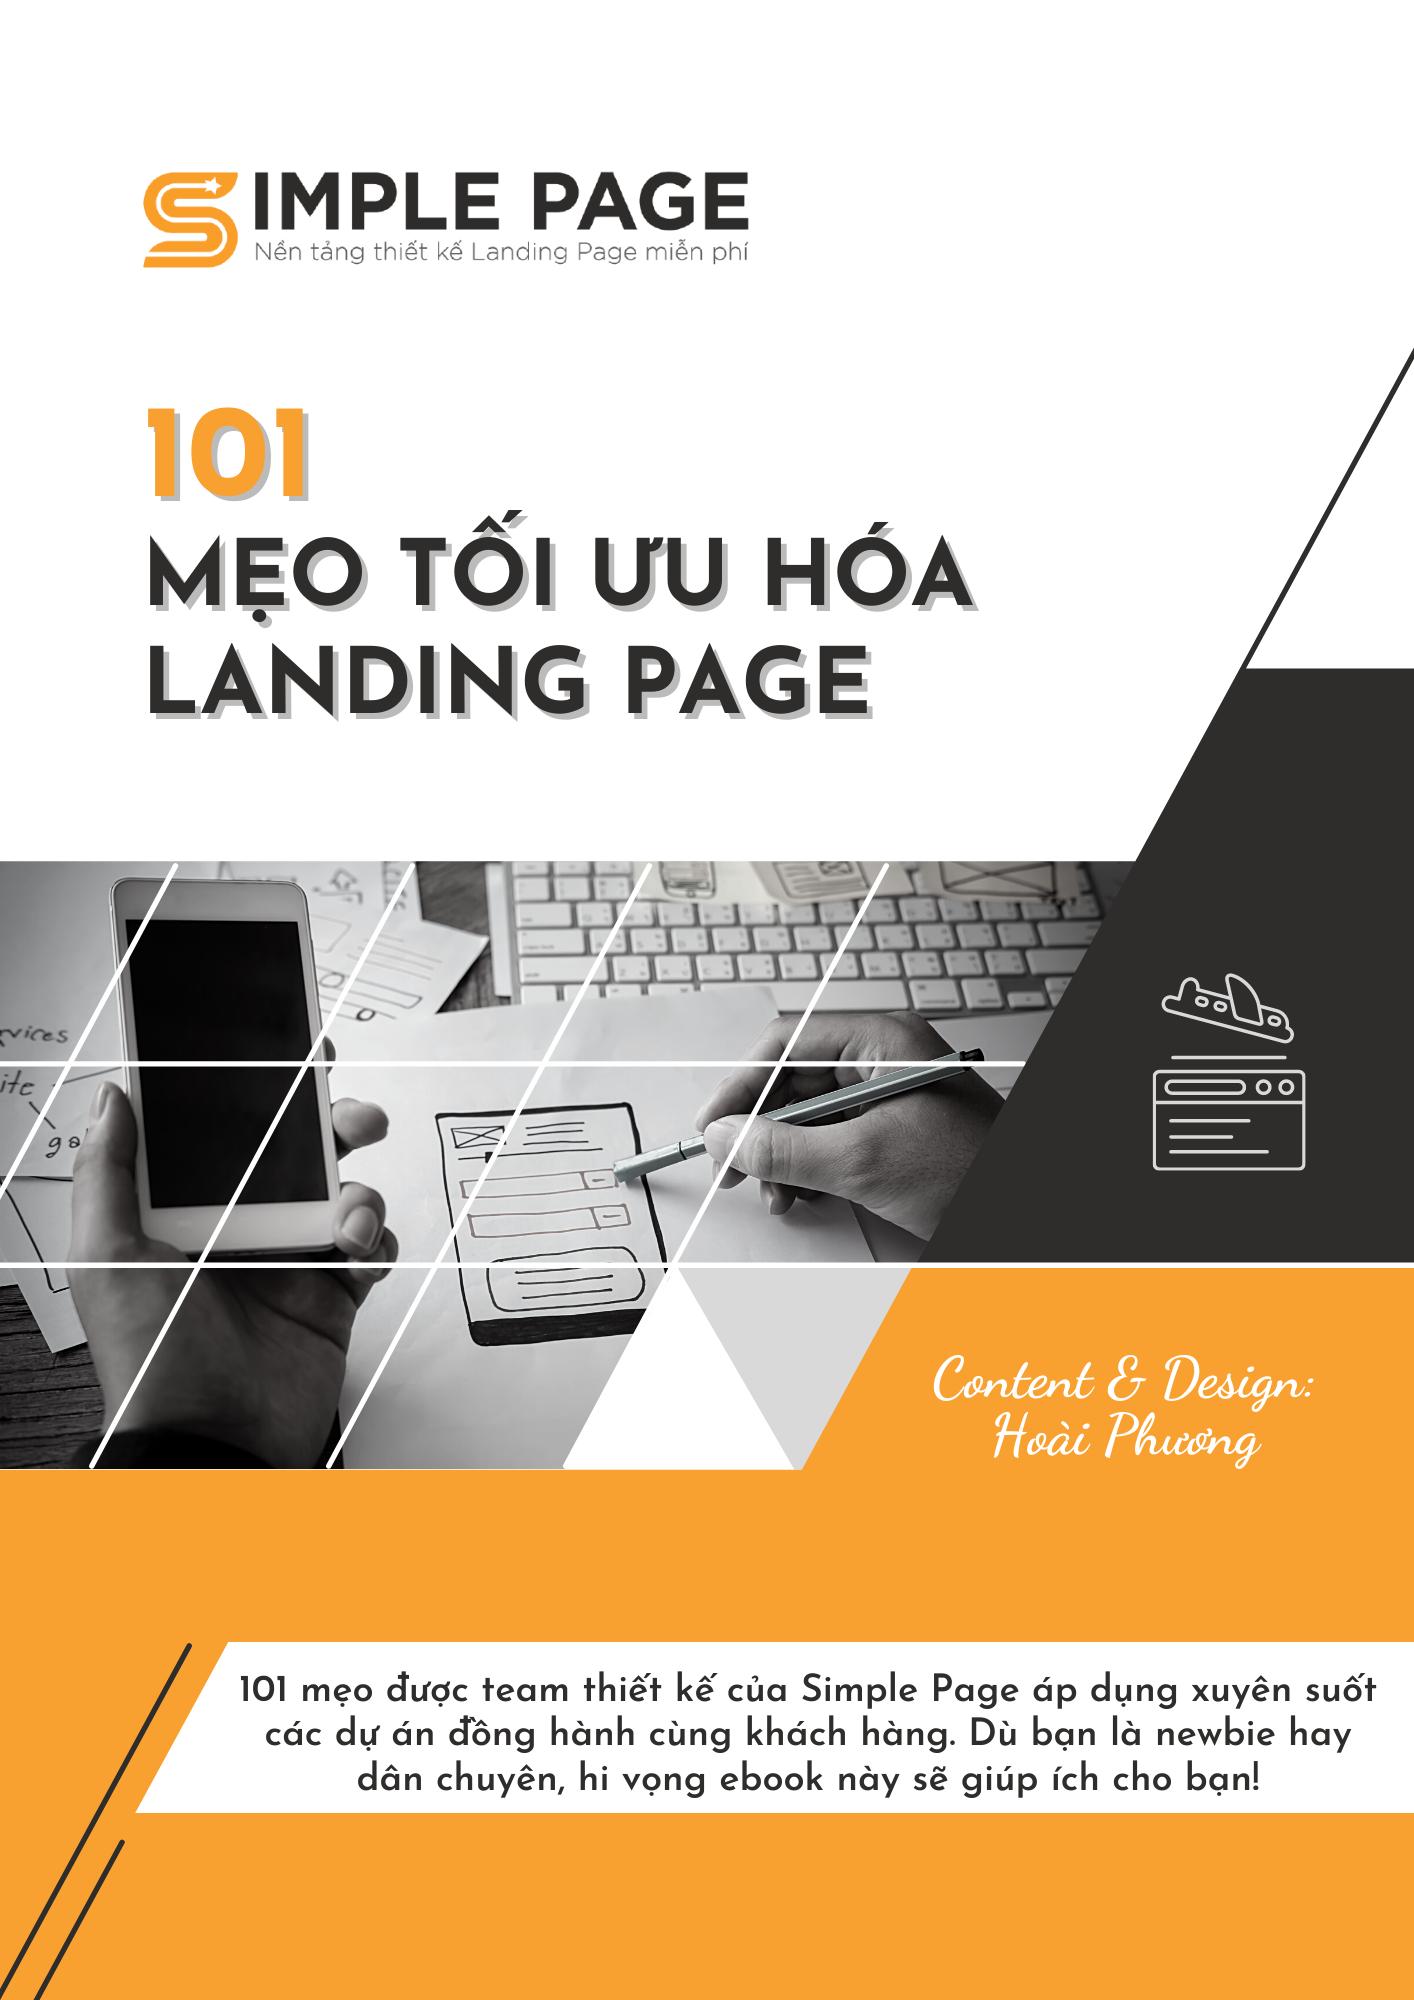 101 Mẹo tối ưu hóa Landing Page